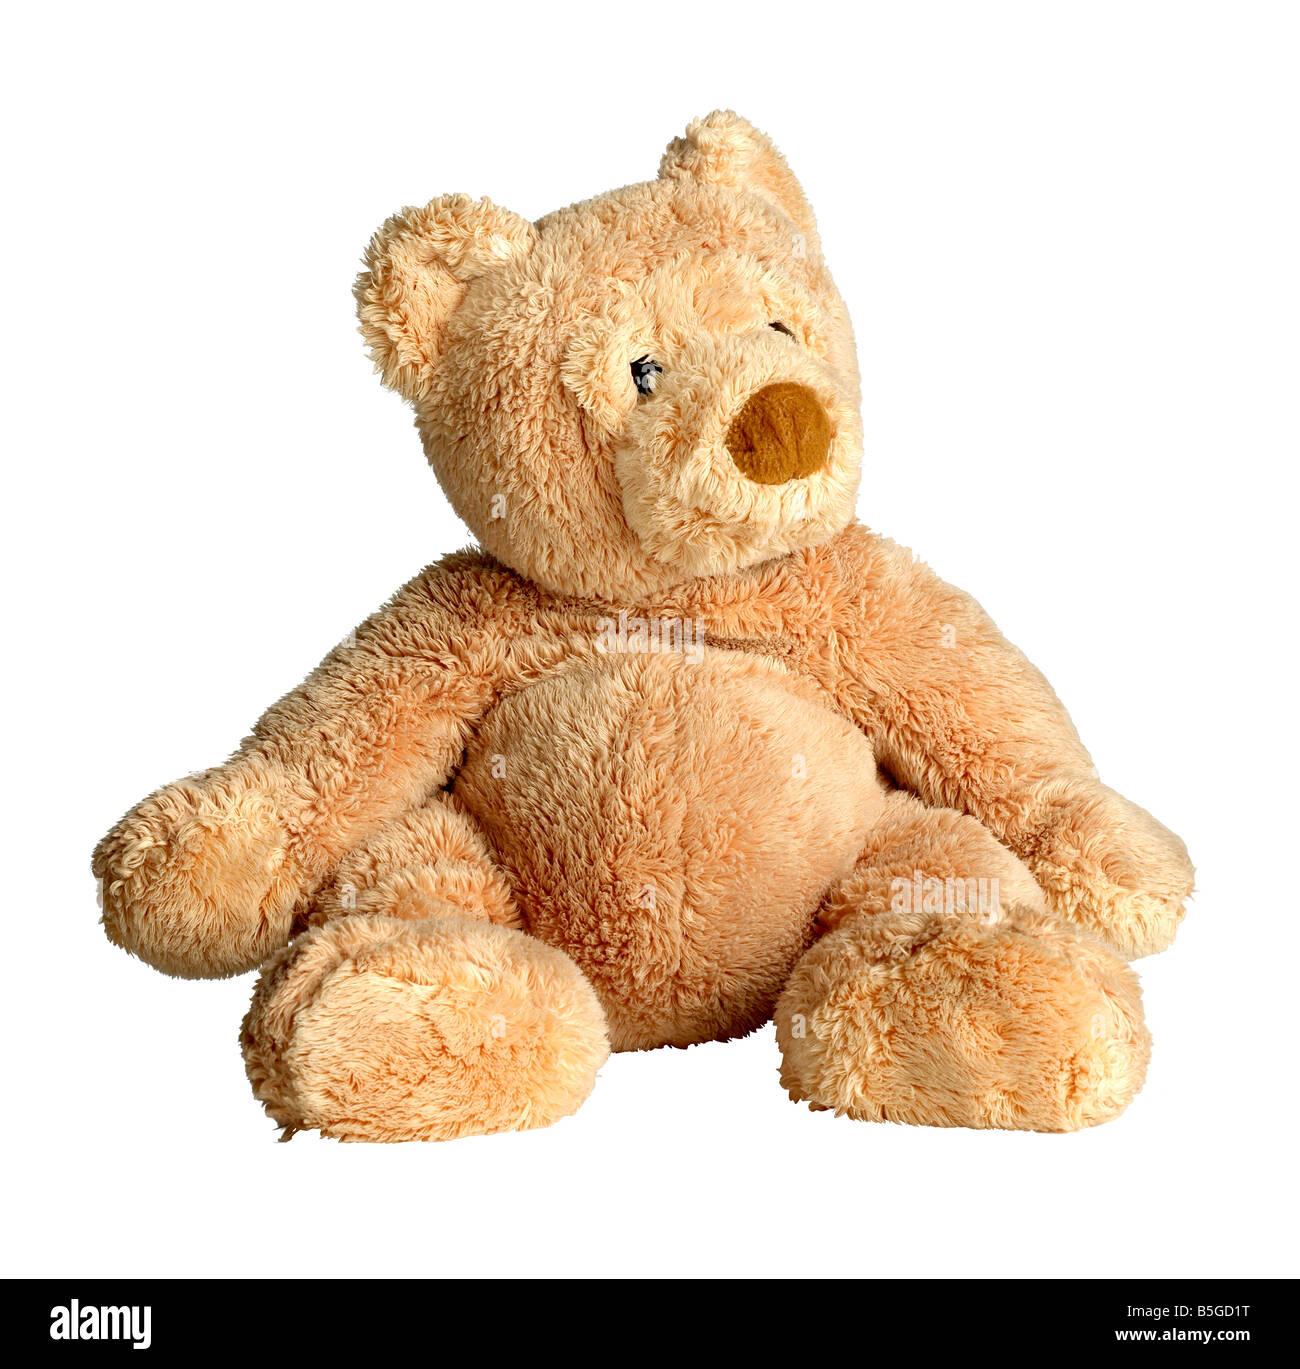 Tan teddy bear sitting Stuffed animal - Stock Image